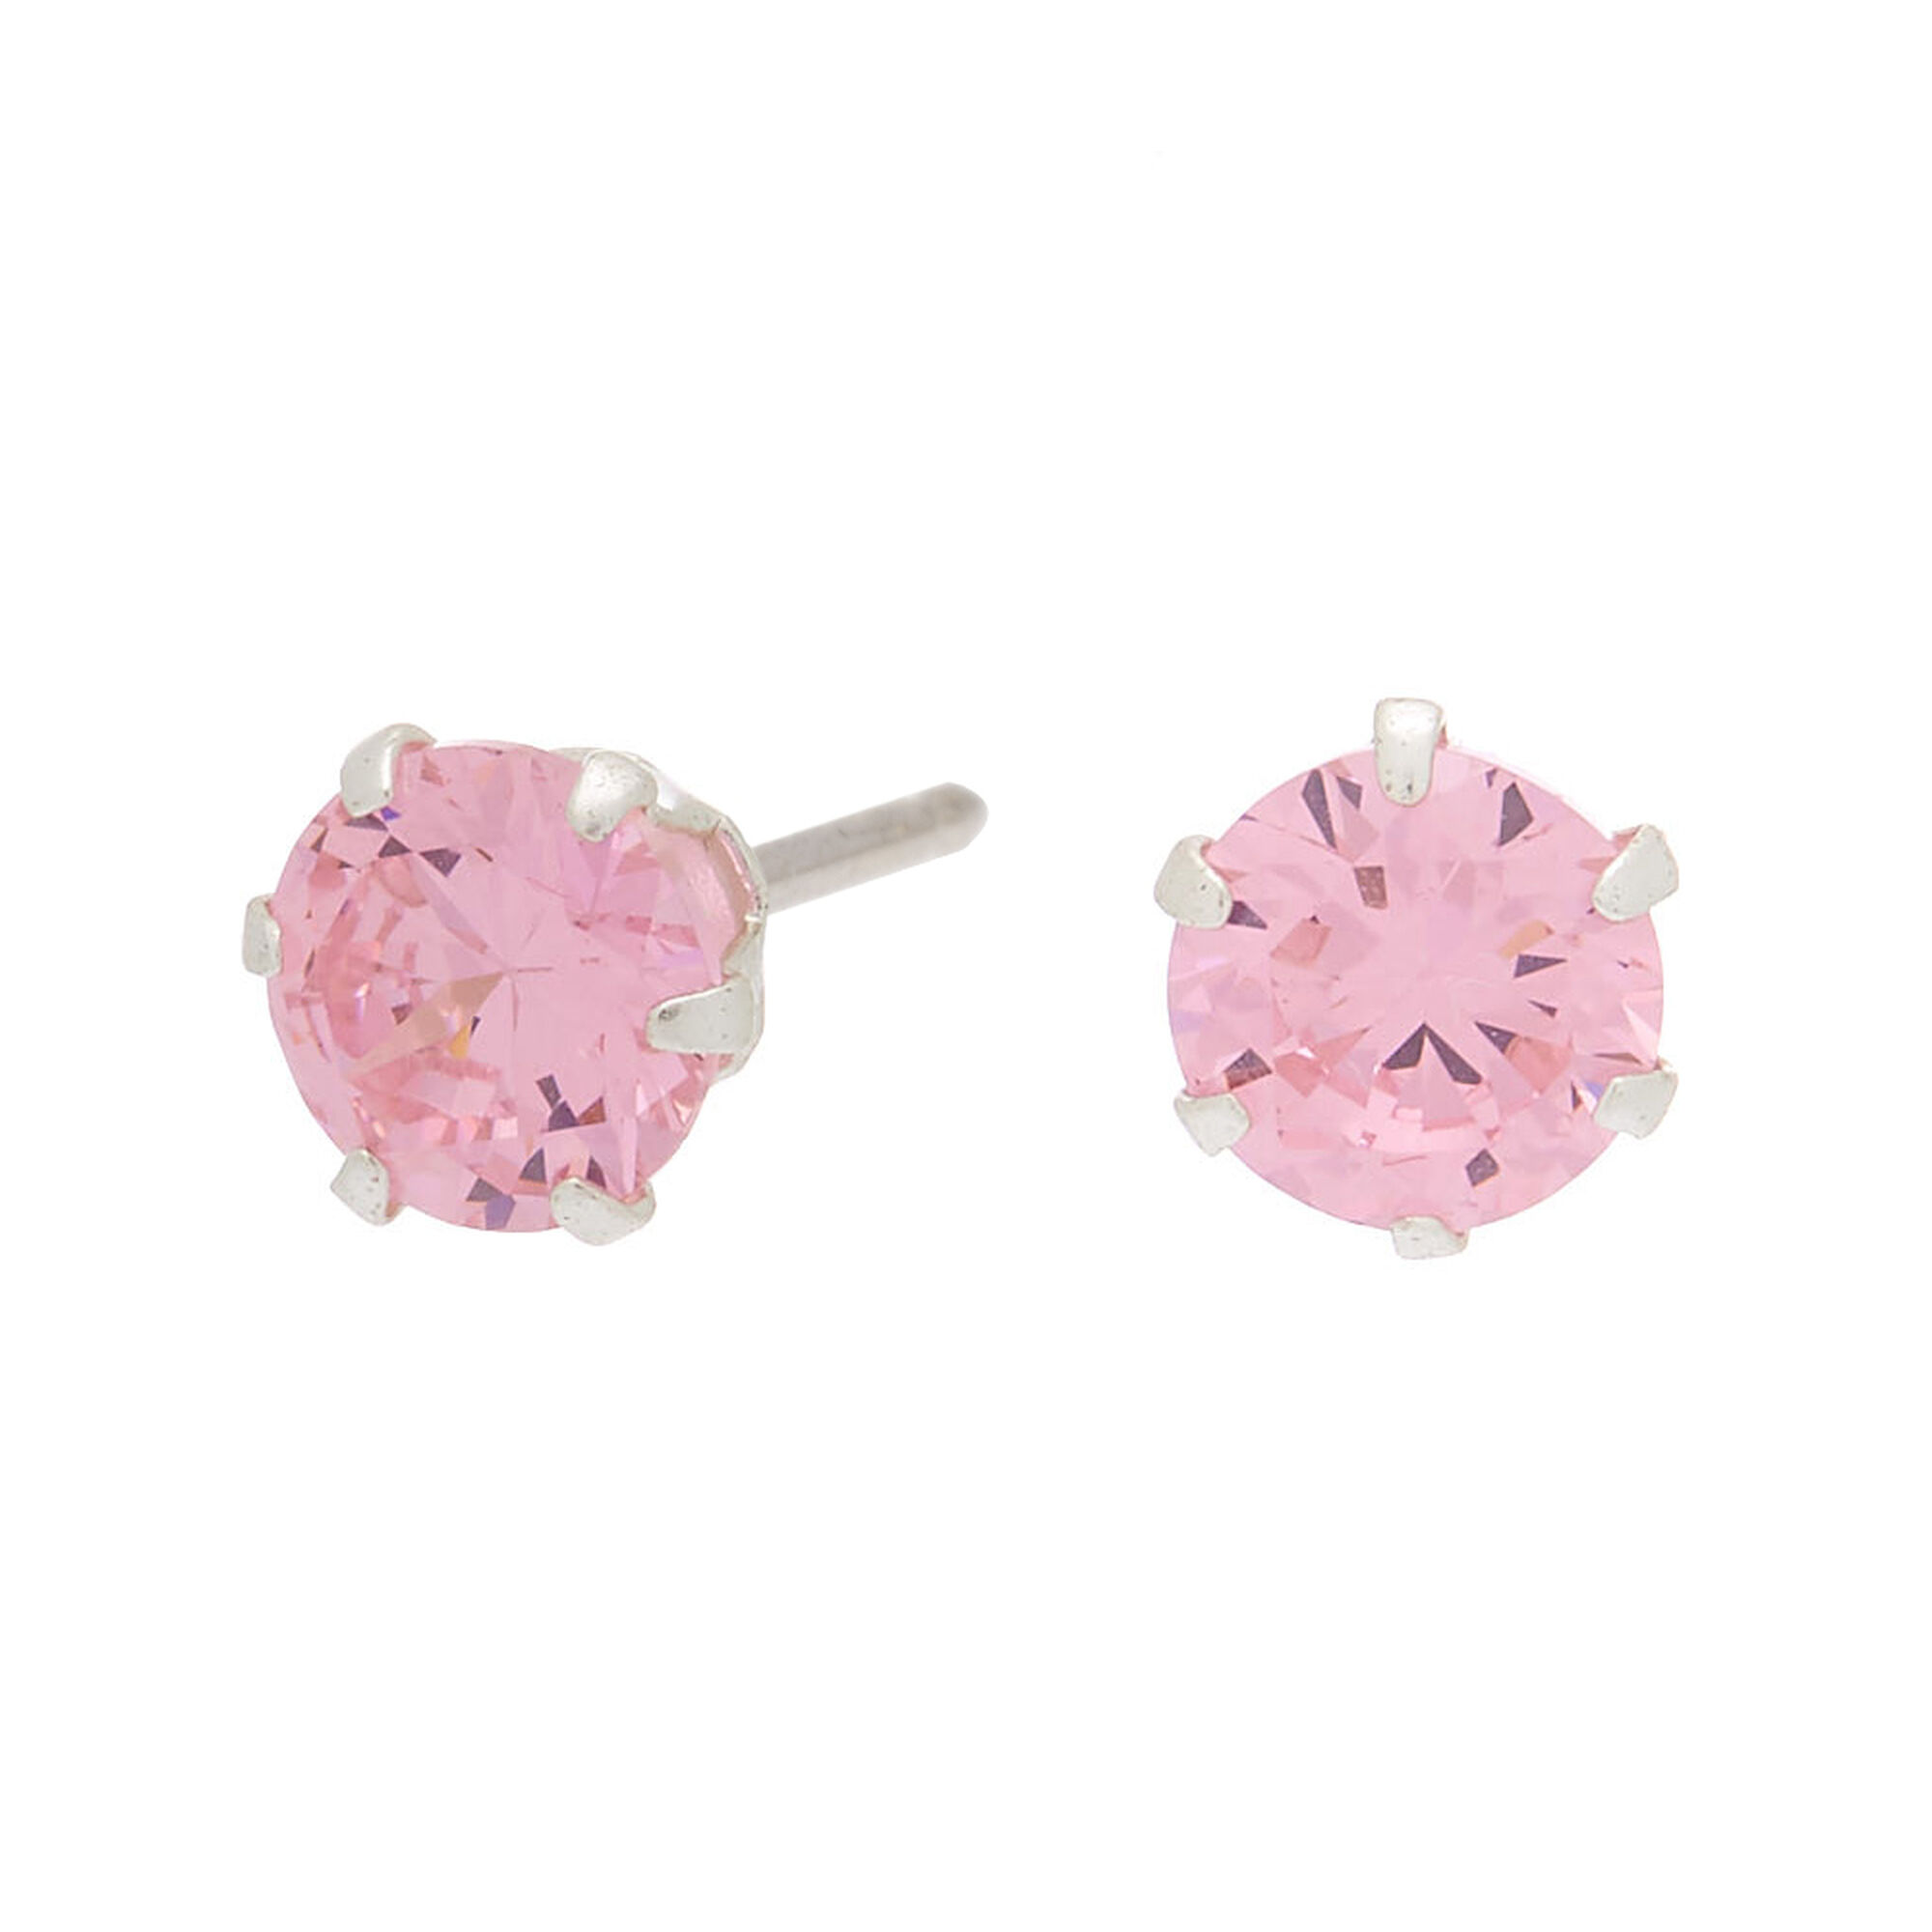 Sterling Silver Cubic Zirconia Stud Earrings Pink